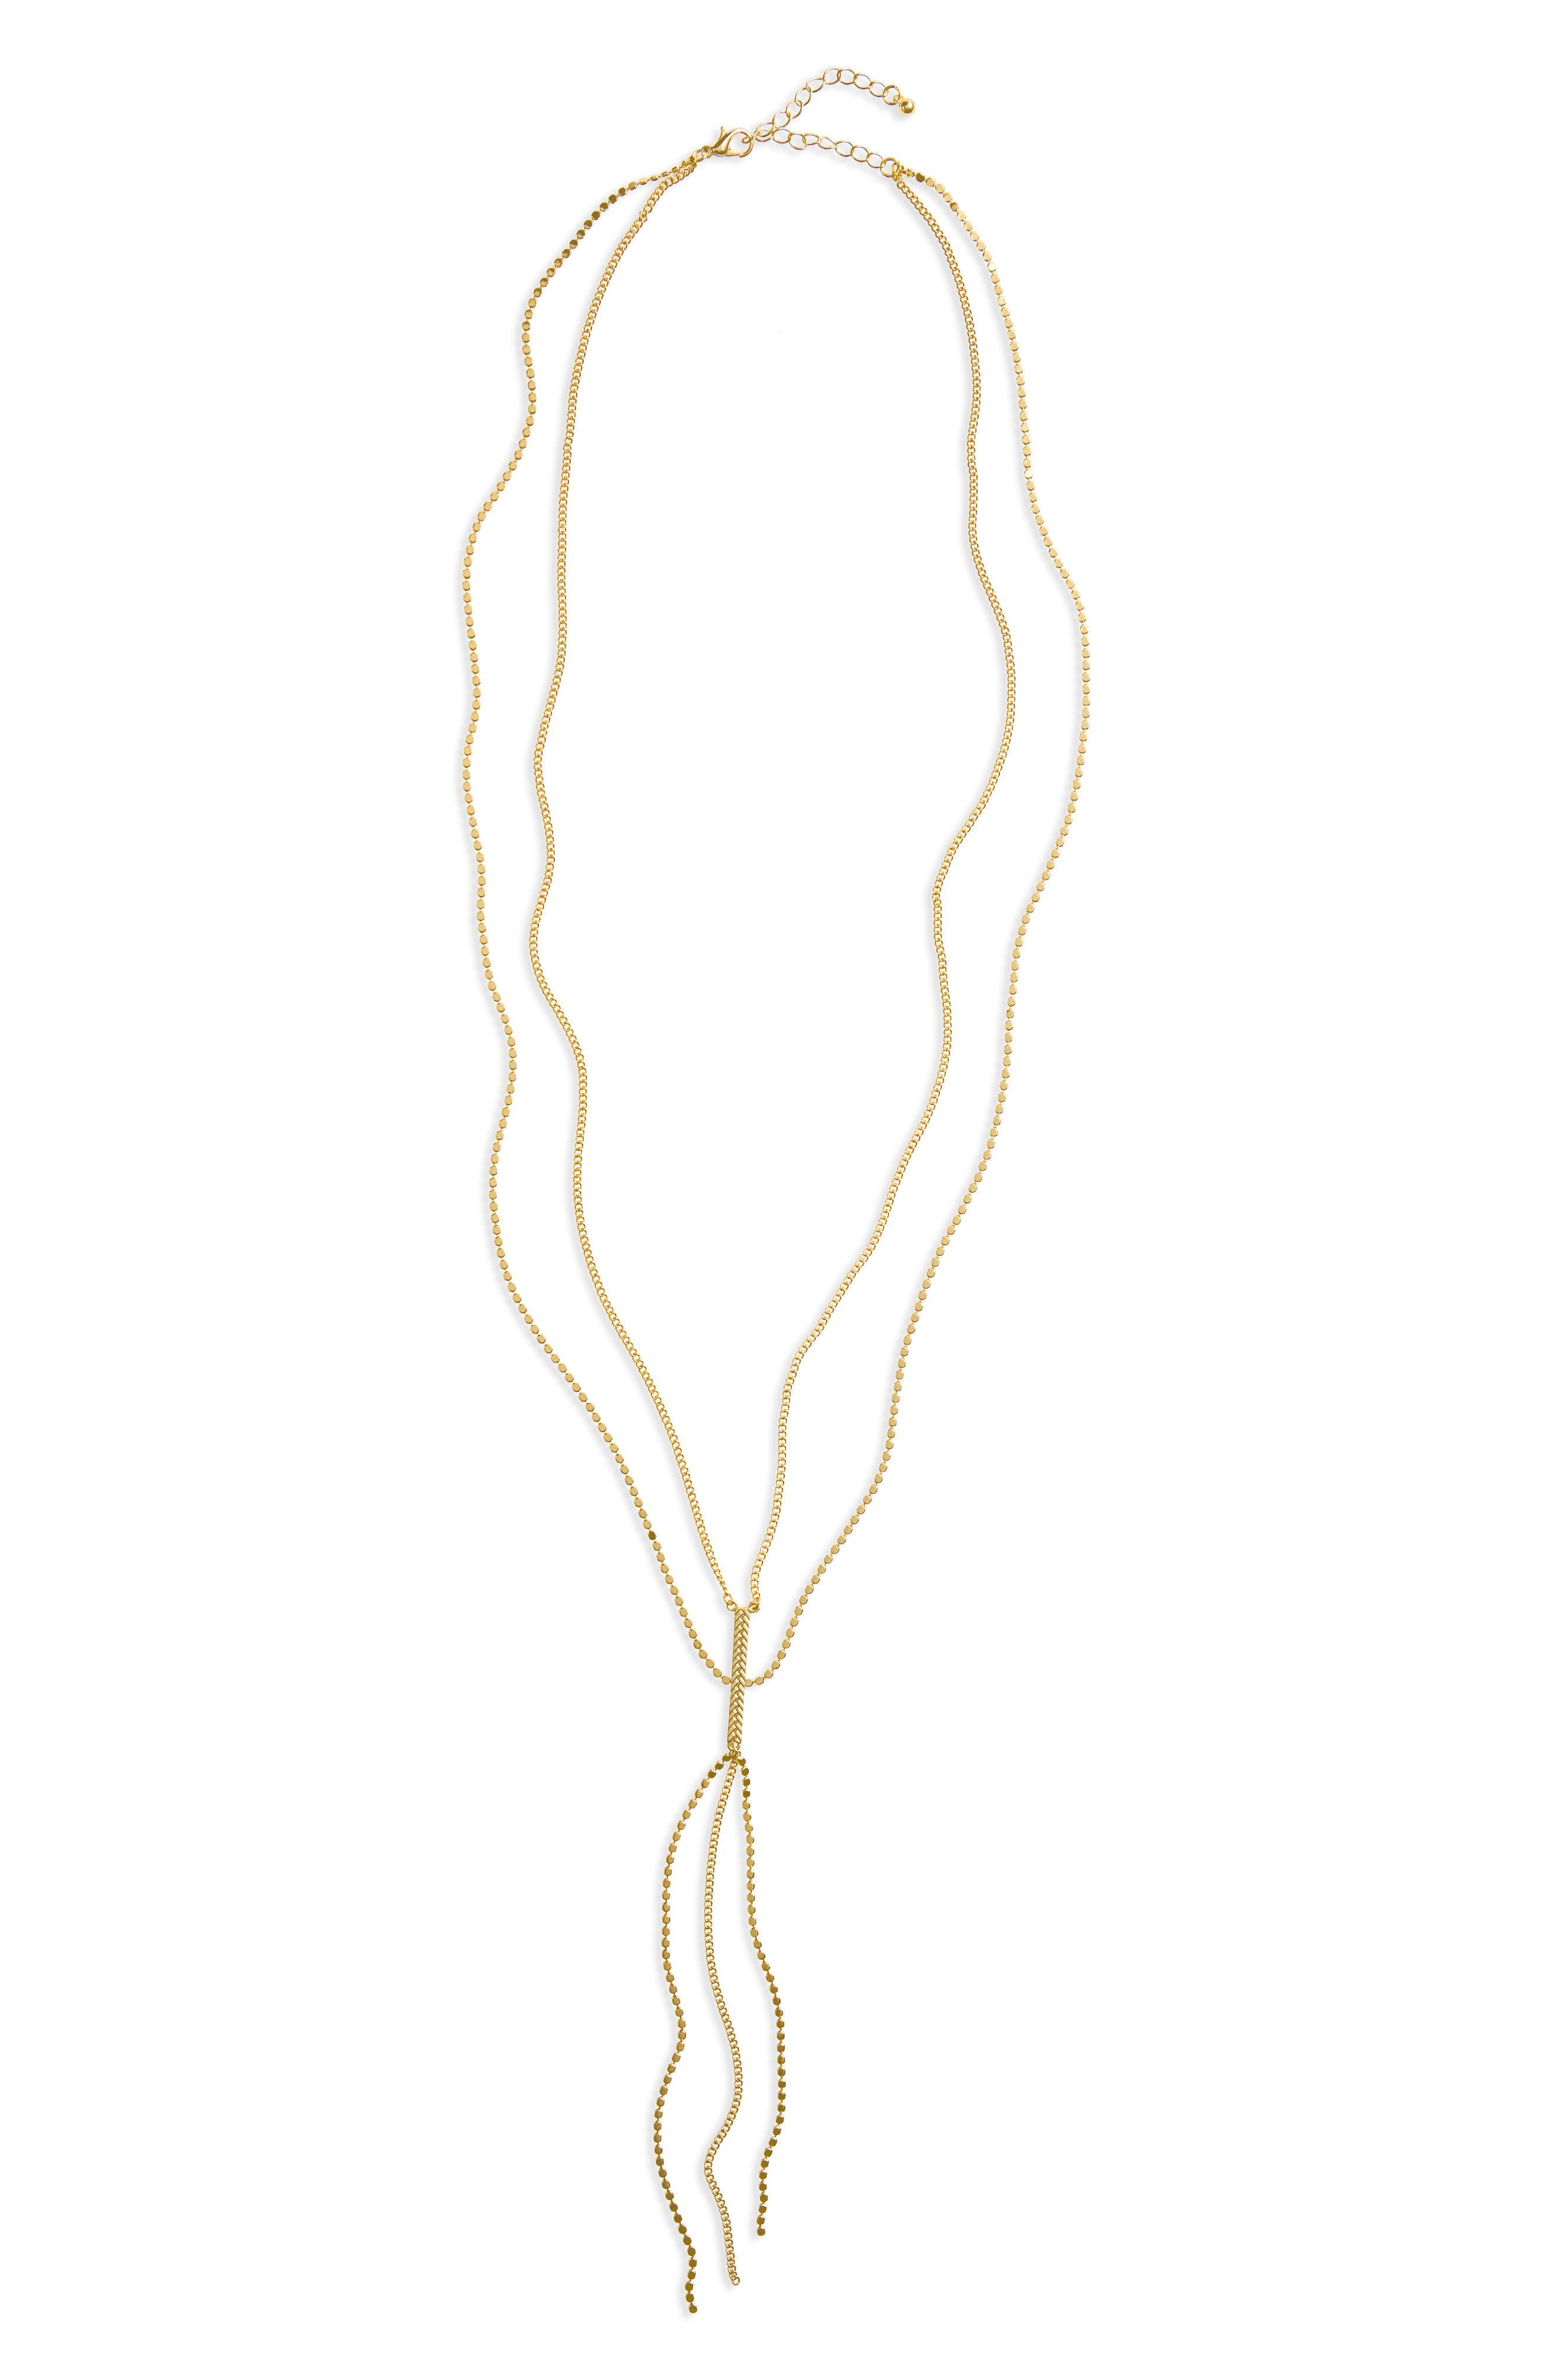 Main Image - Panacea Layered Y-Necklace